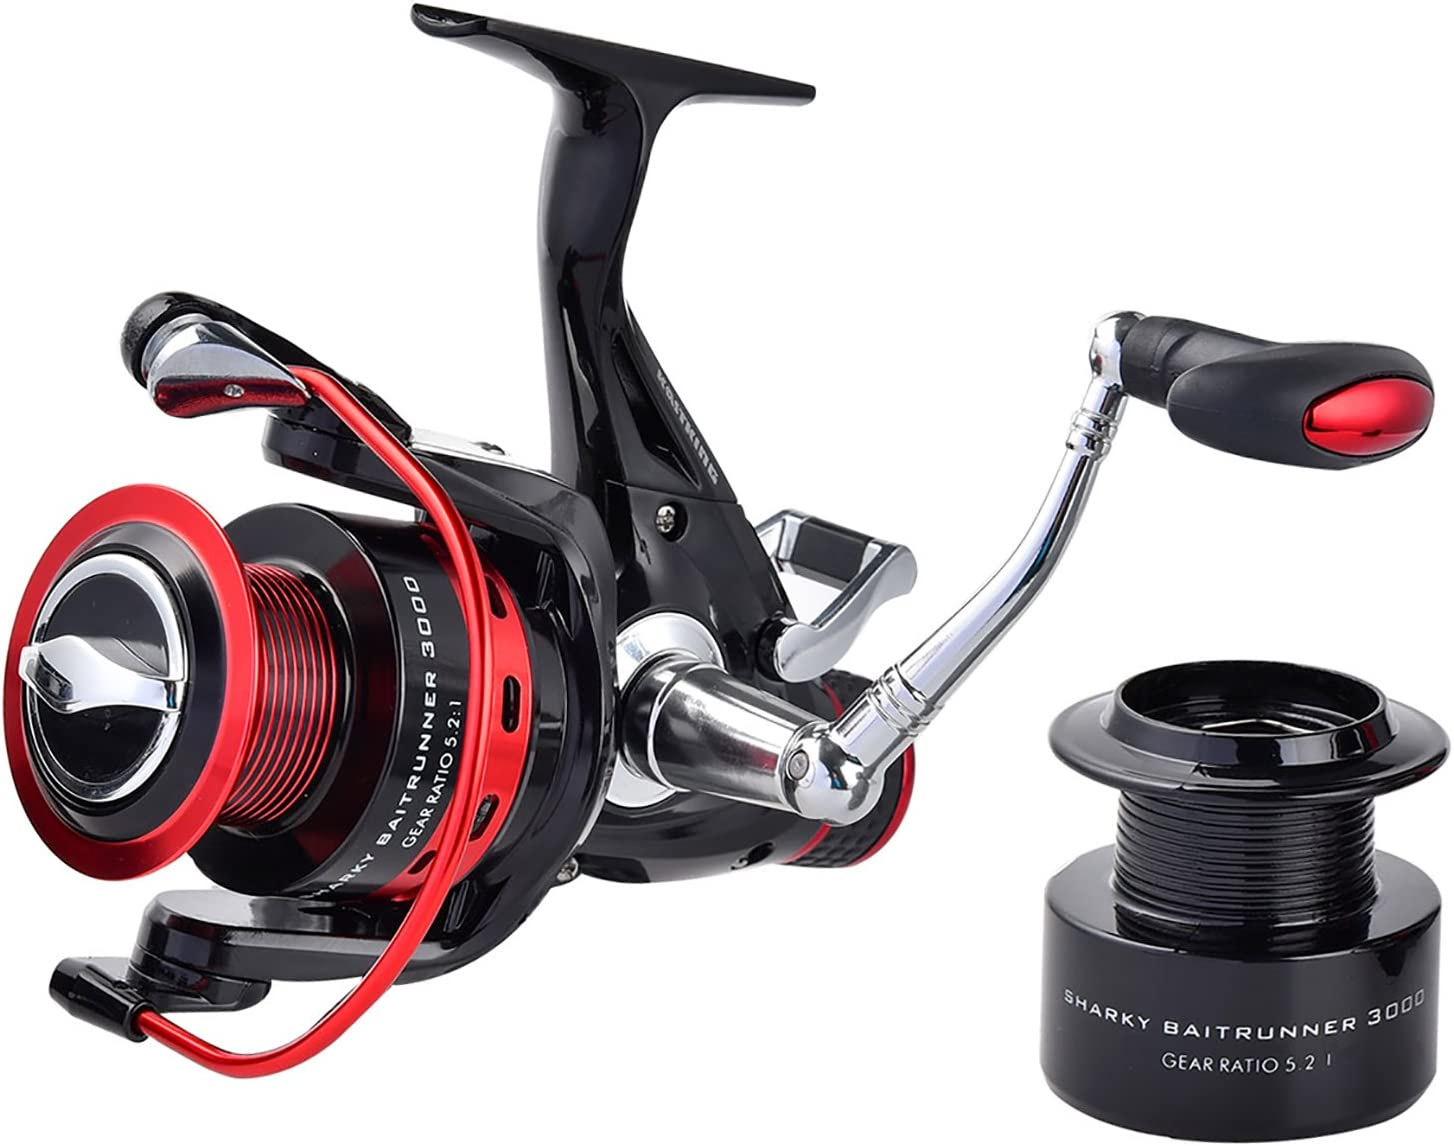 KastKing Sharky Baitfeeder III 3000 Spinning Fishing Reel Match Feeder Reel